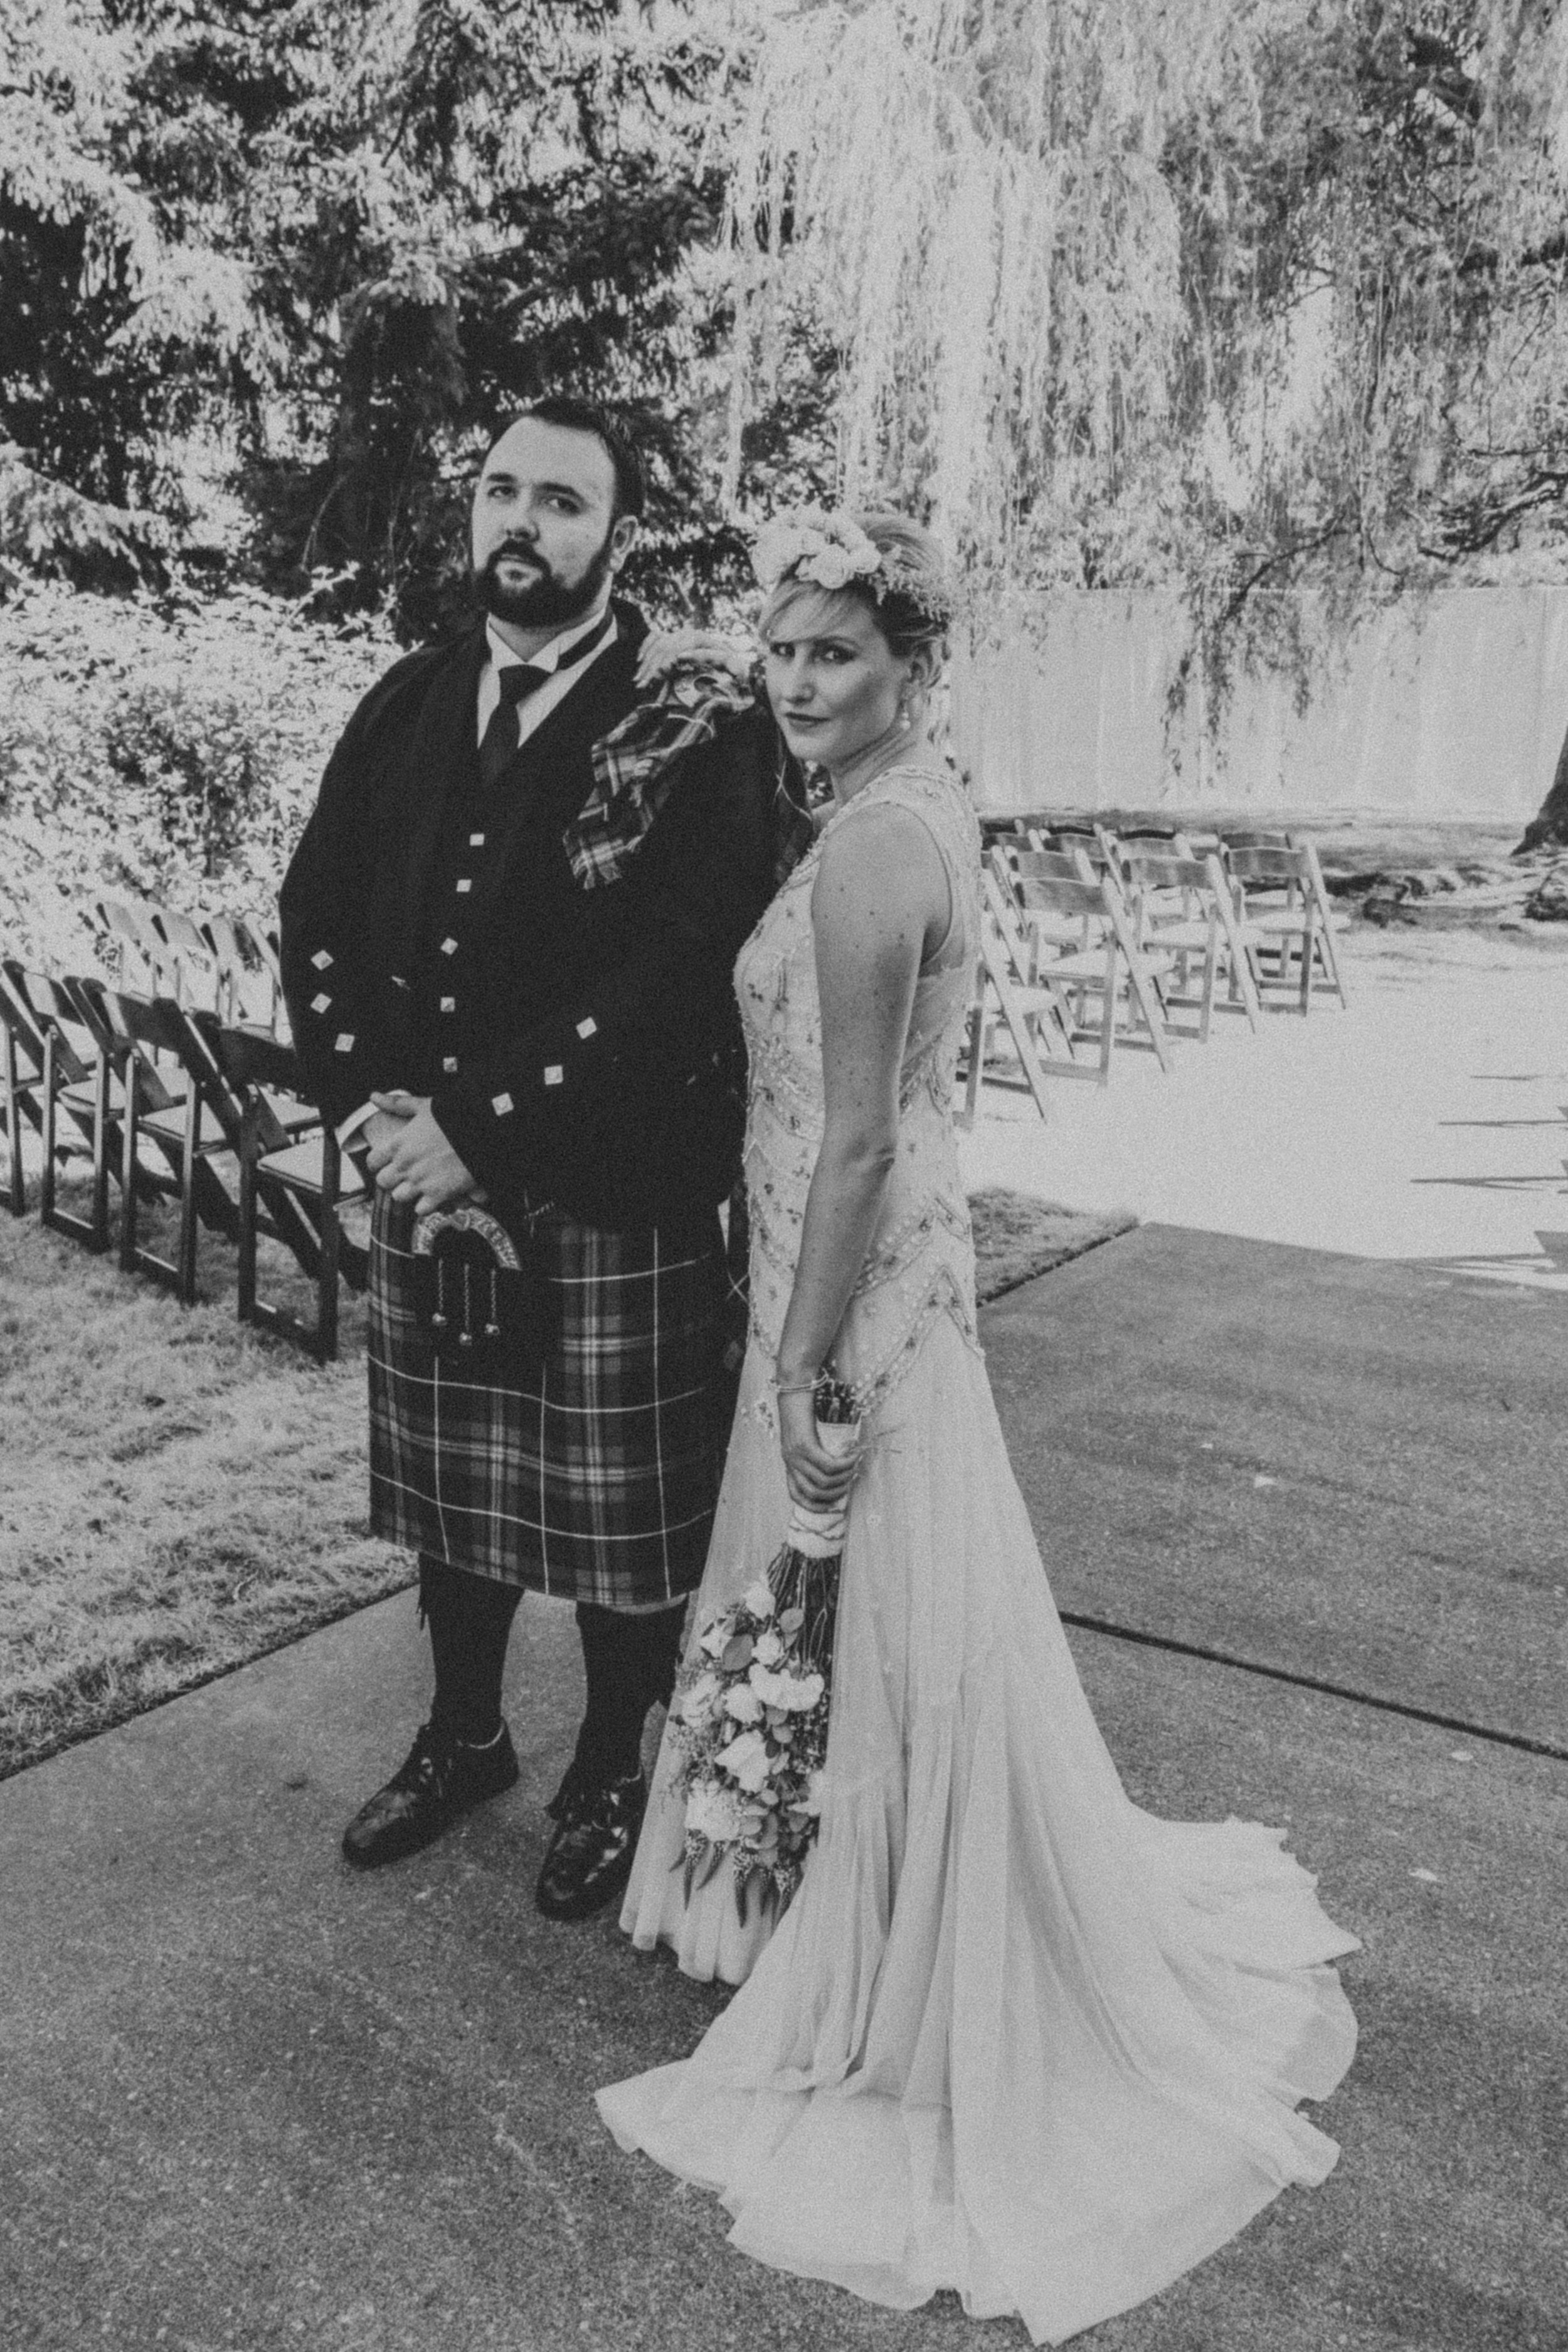 Donaldson_Bride and Groom Portraits_59.jpg